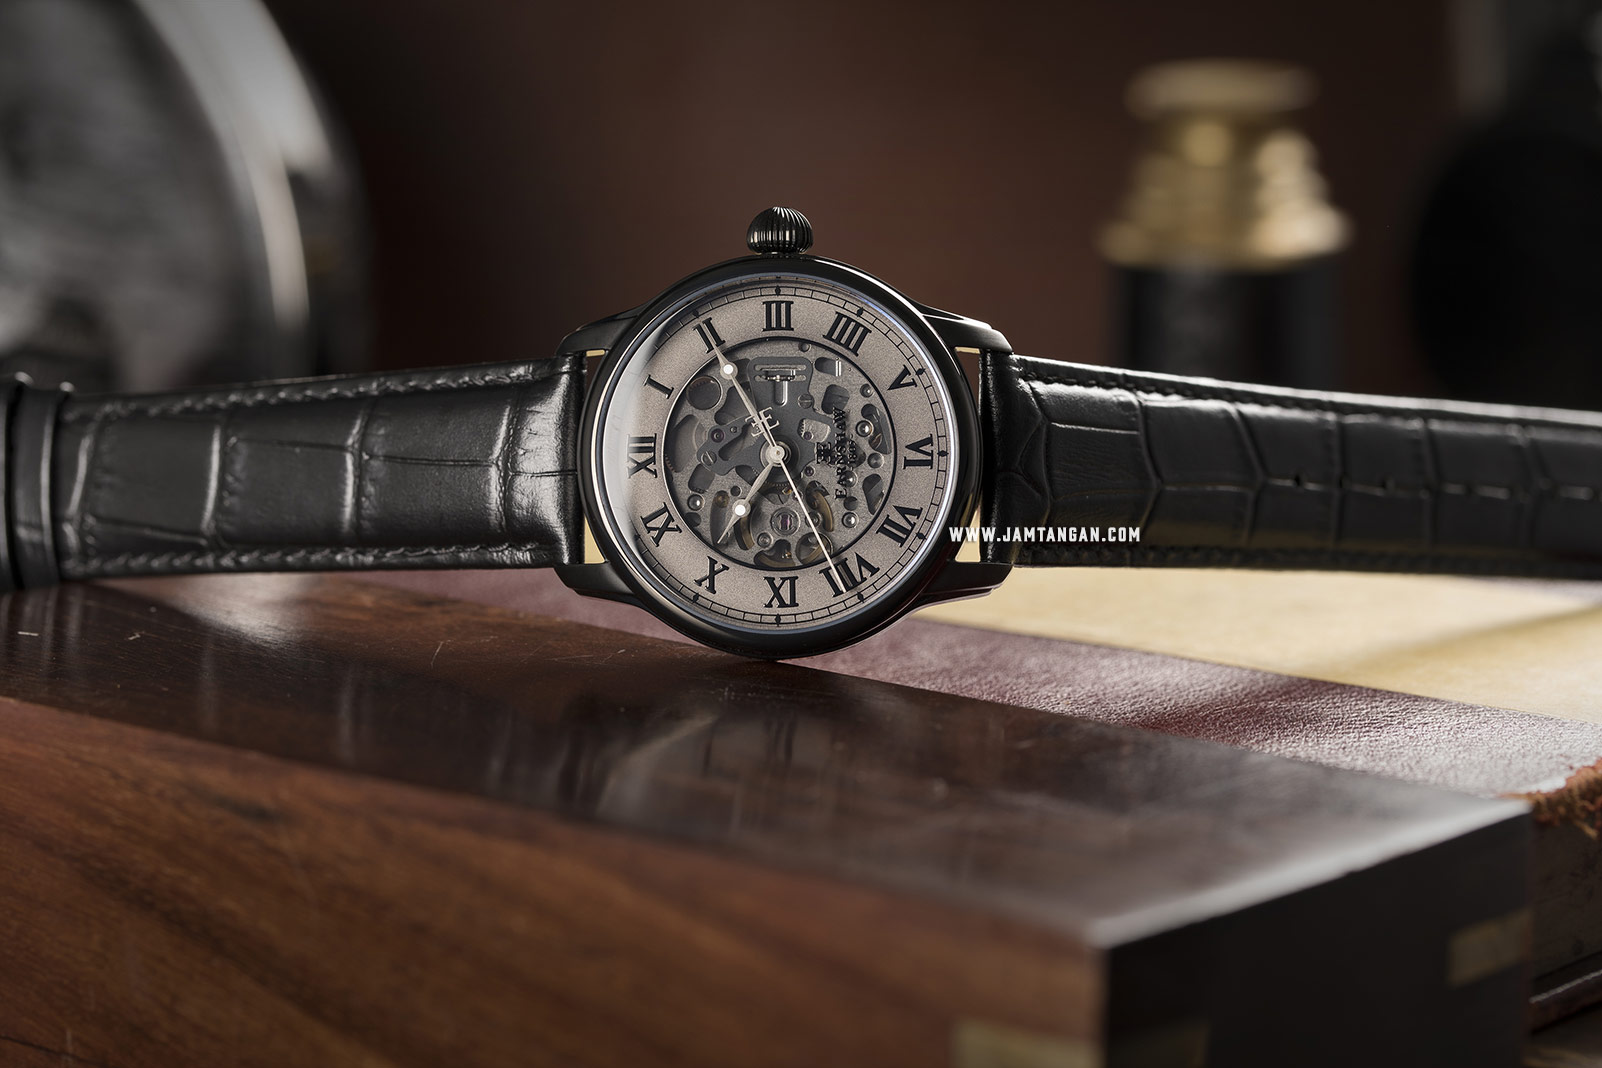 Thomas Earnshaw ES-8807-03 Longitude Skeleton Dial Black Leather Strap Machtwatch